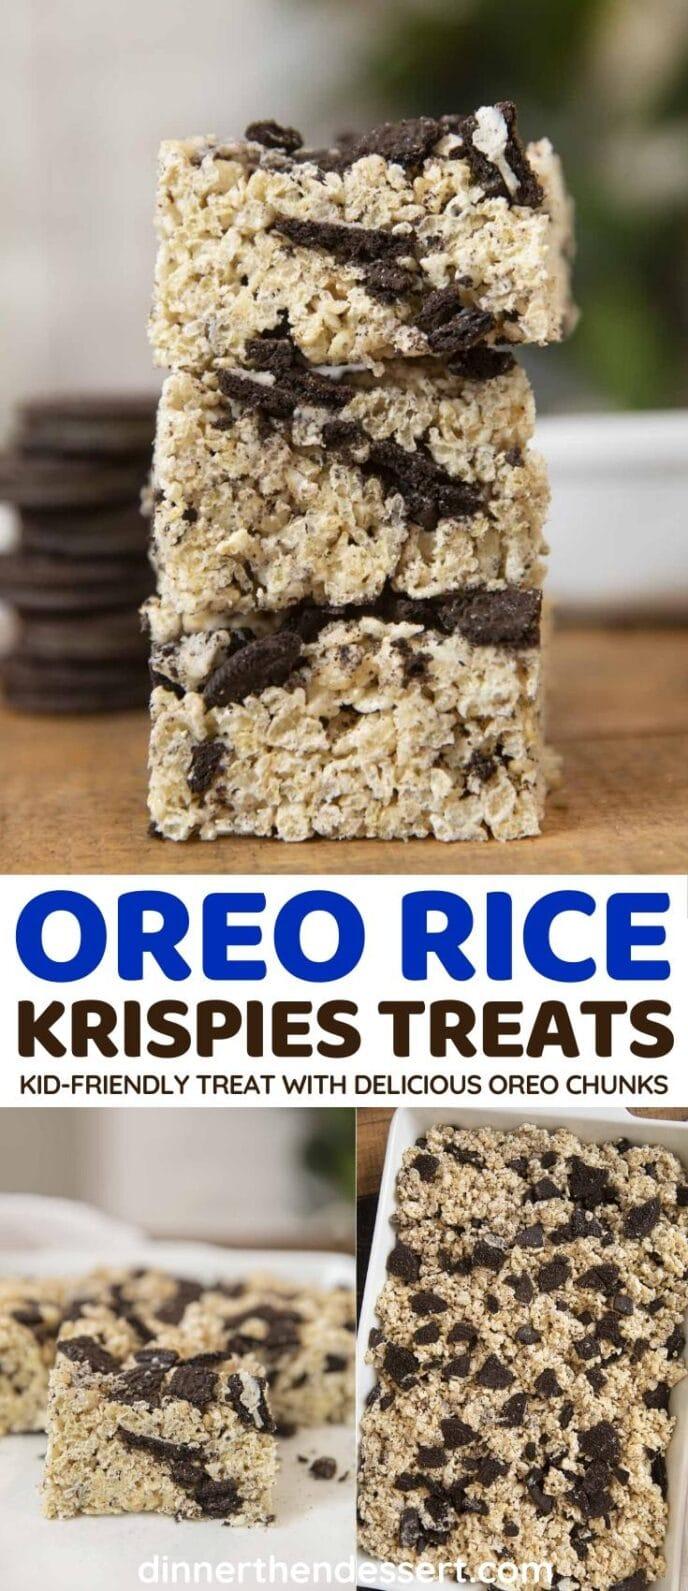 Oreo Rice Krispies Treats collage